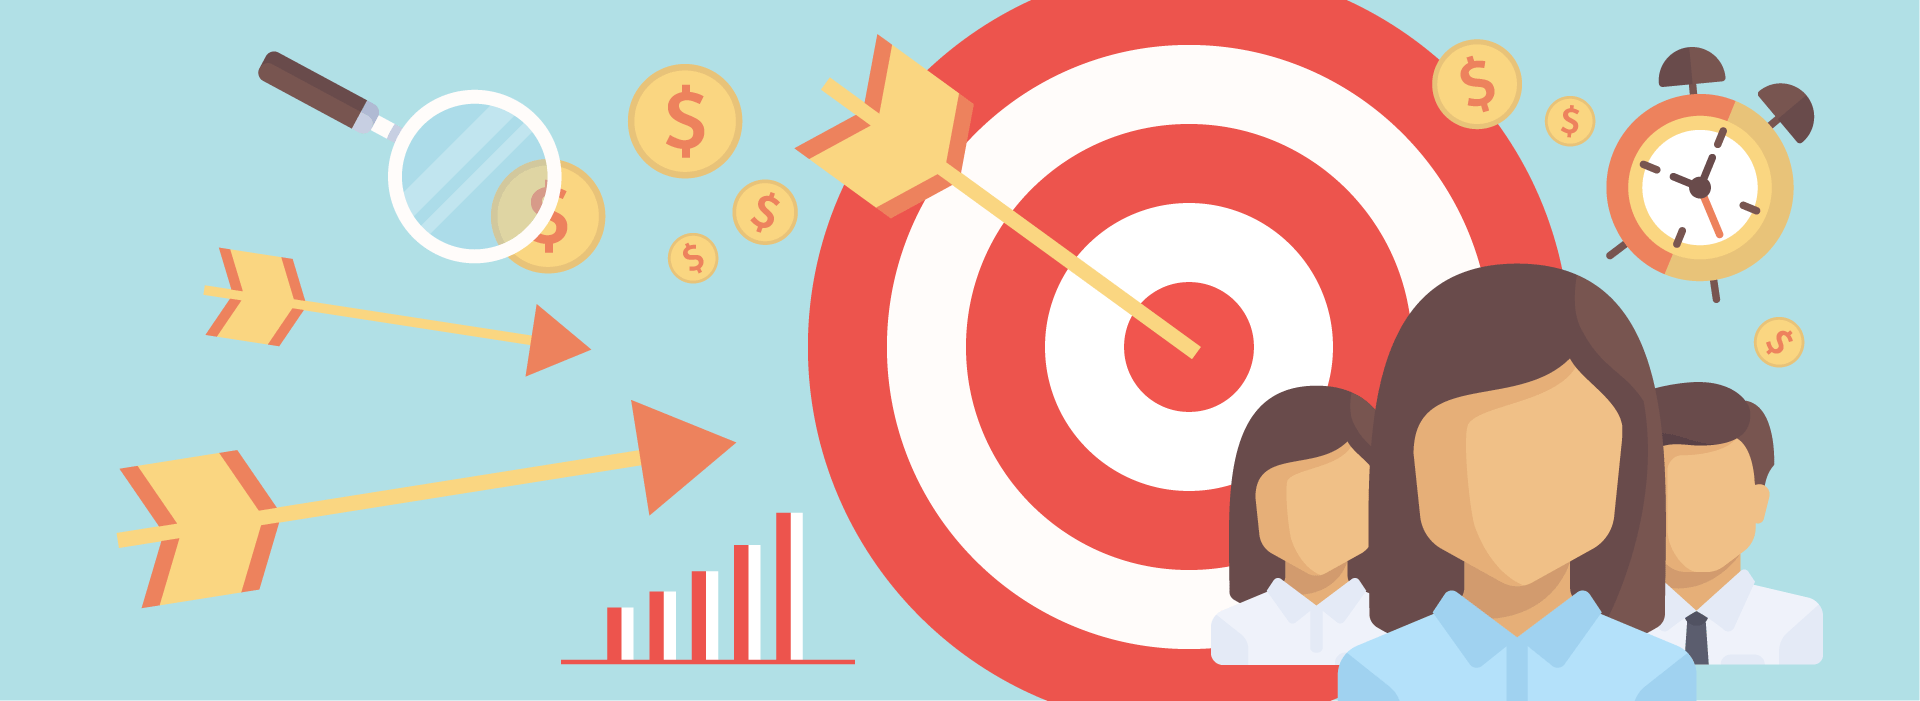 digital-marketing-strategy-targetaudience